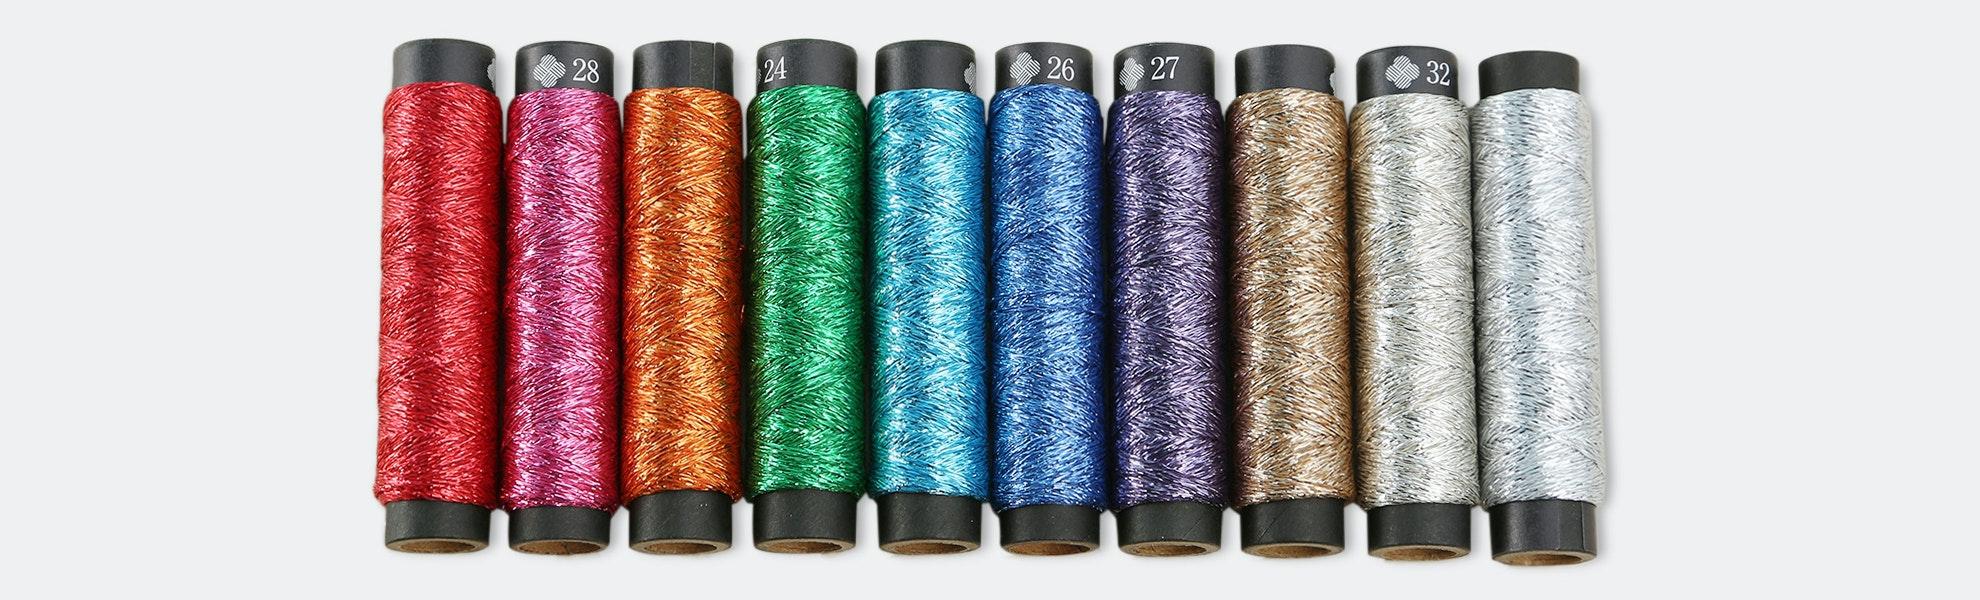 Nishikiito Metallic Embroidery Thread by Cosmo